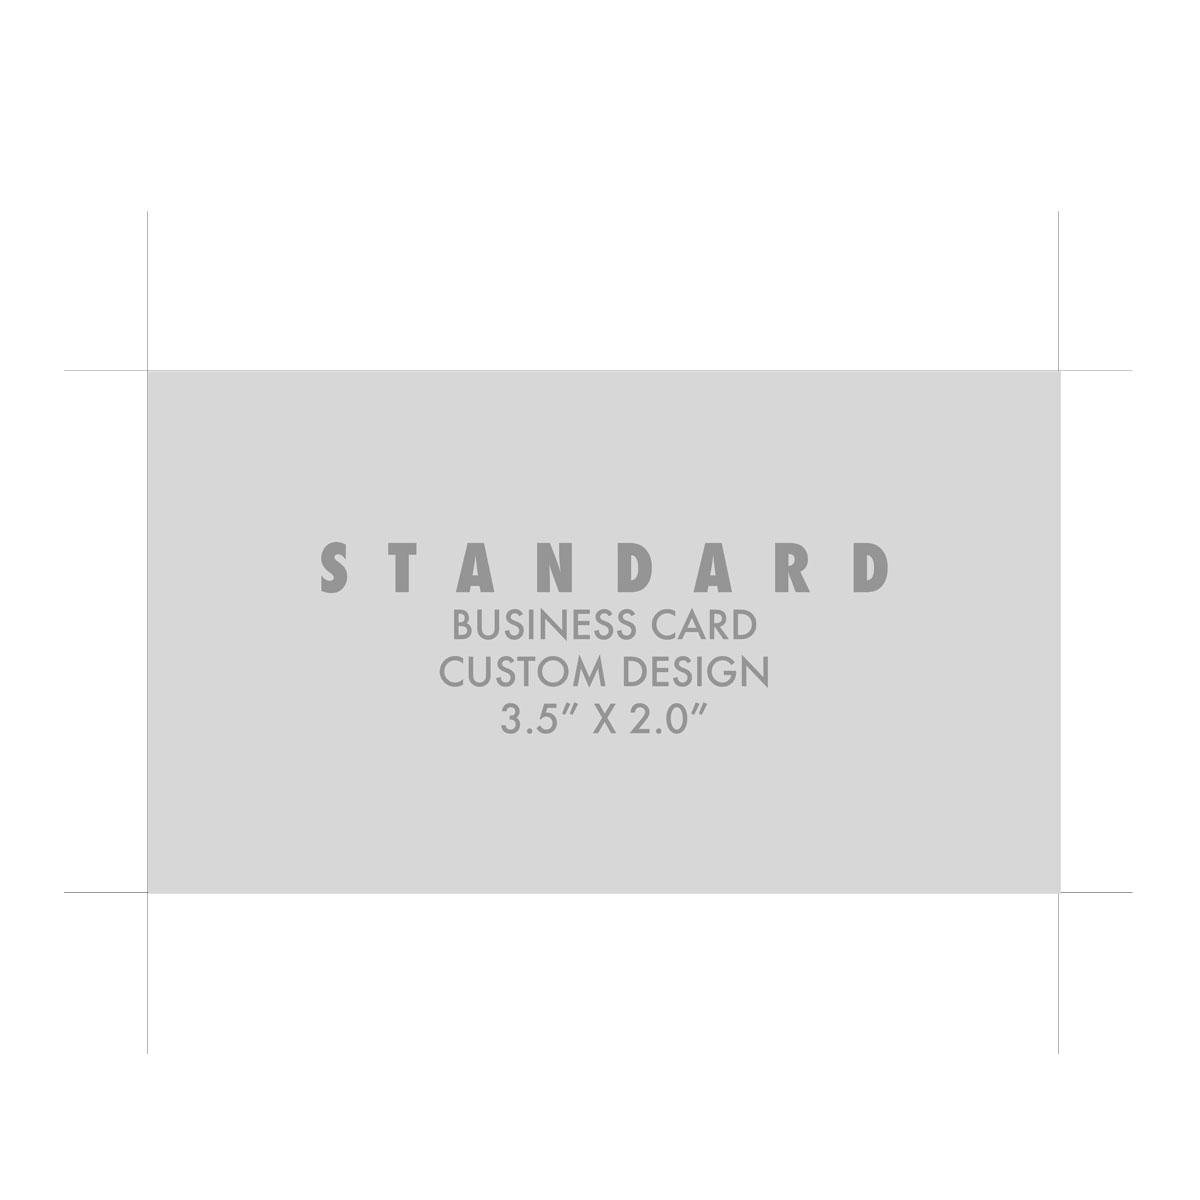 BUSINESS CARD: STANDARD CUSTOM DESIGN - Creative Solutions Studio